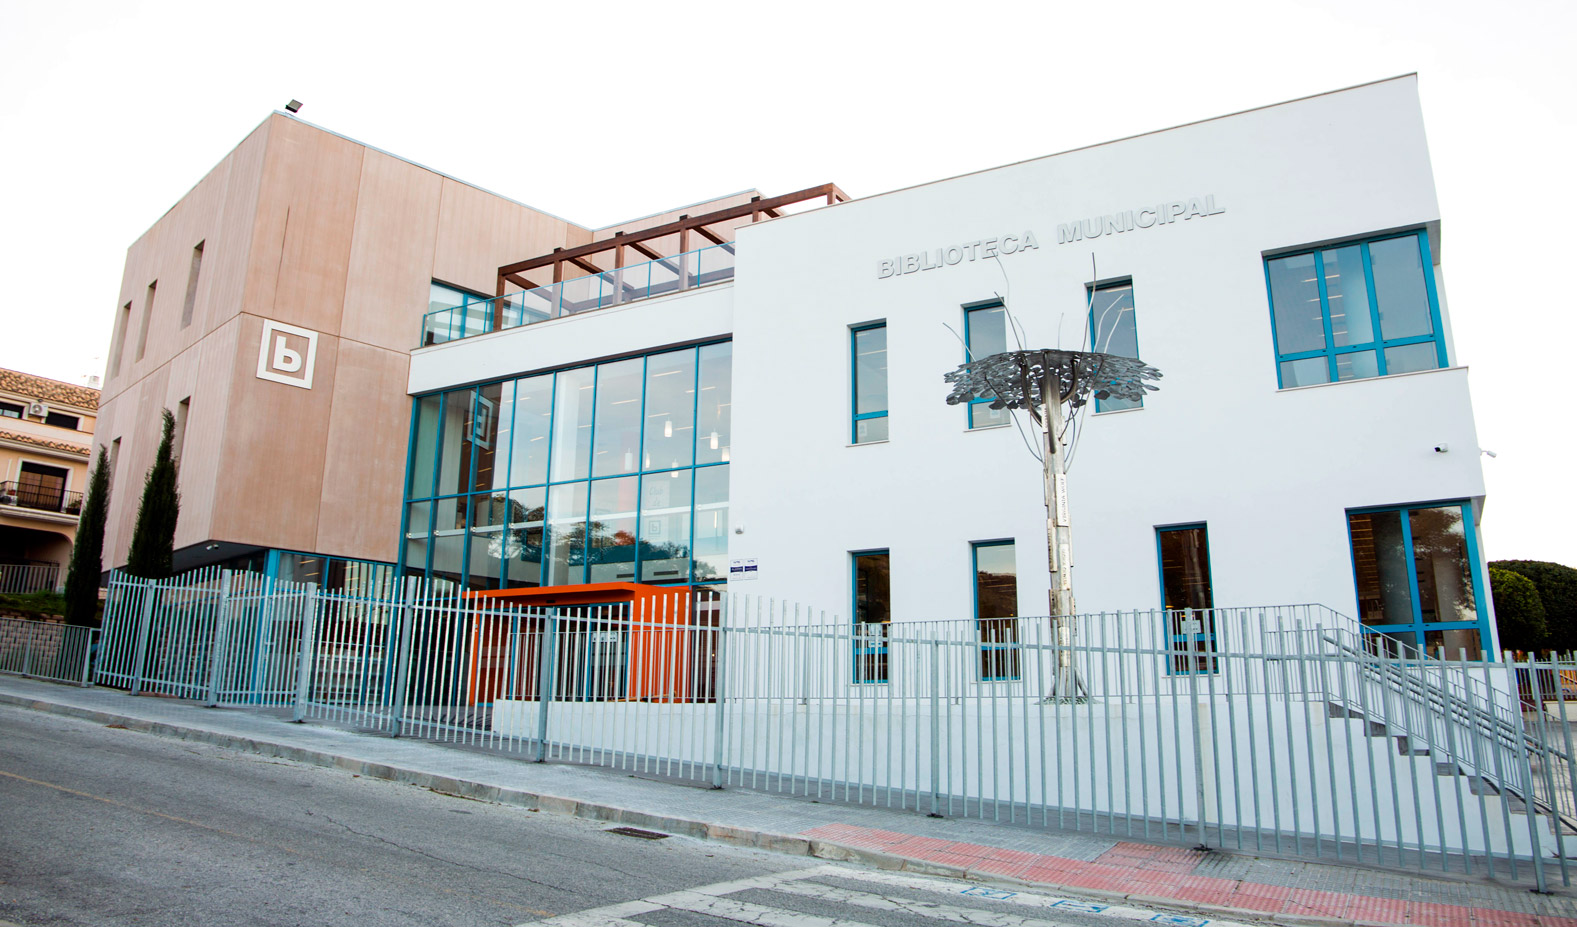 Biblioteca Pública Municipal de Alhaurín de la Torre